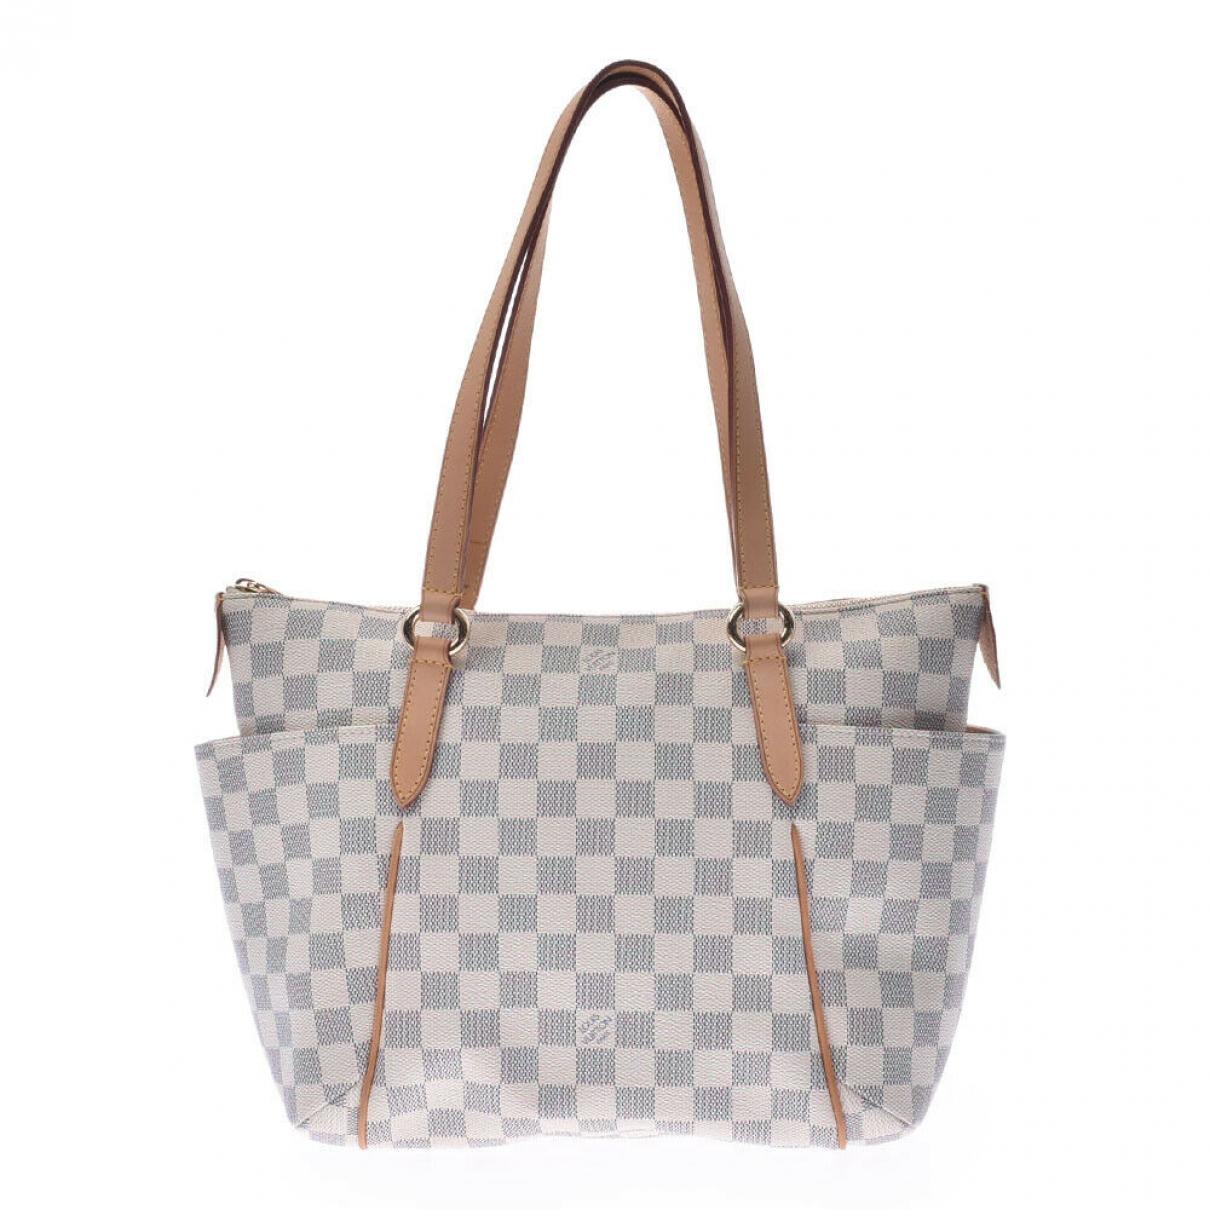 Louis Vuitton Totally Handtasche in  Ecru Leinen